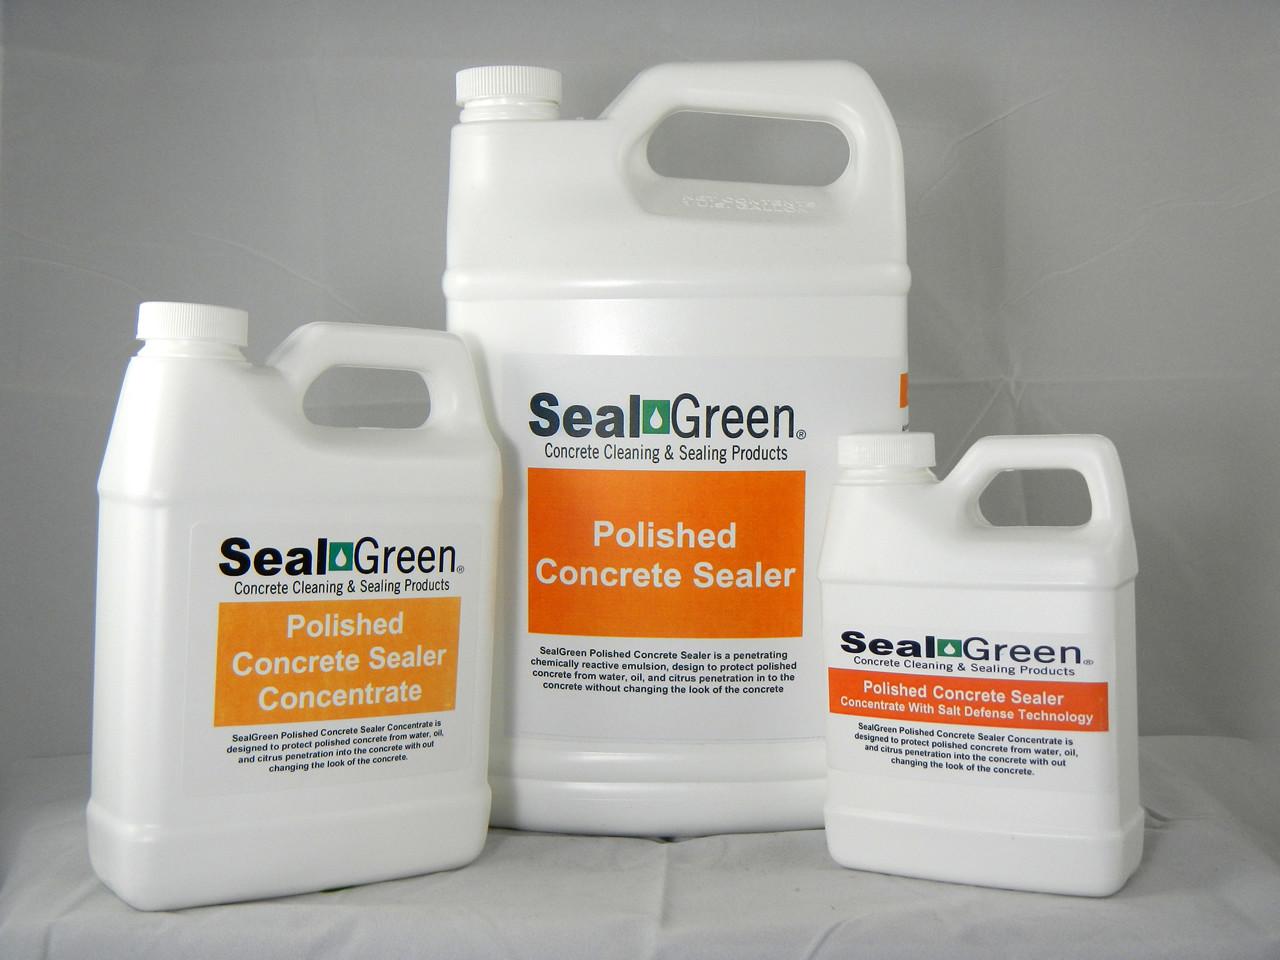 SealGreen Polished Sealer Concrete Concentrate with Salt Defense Technology